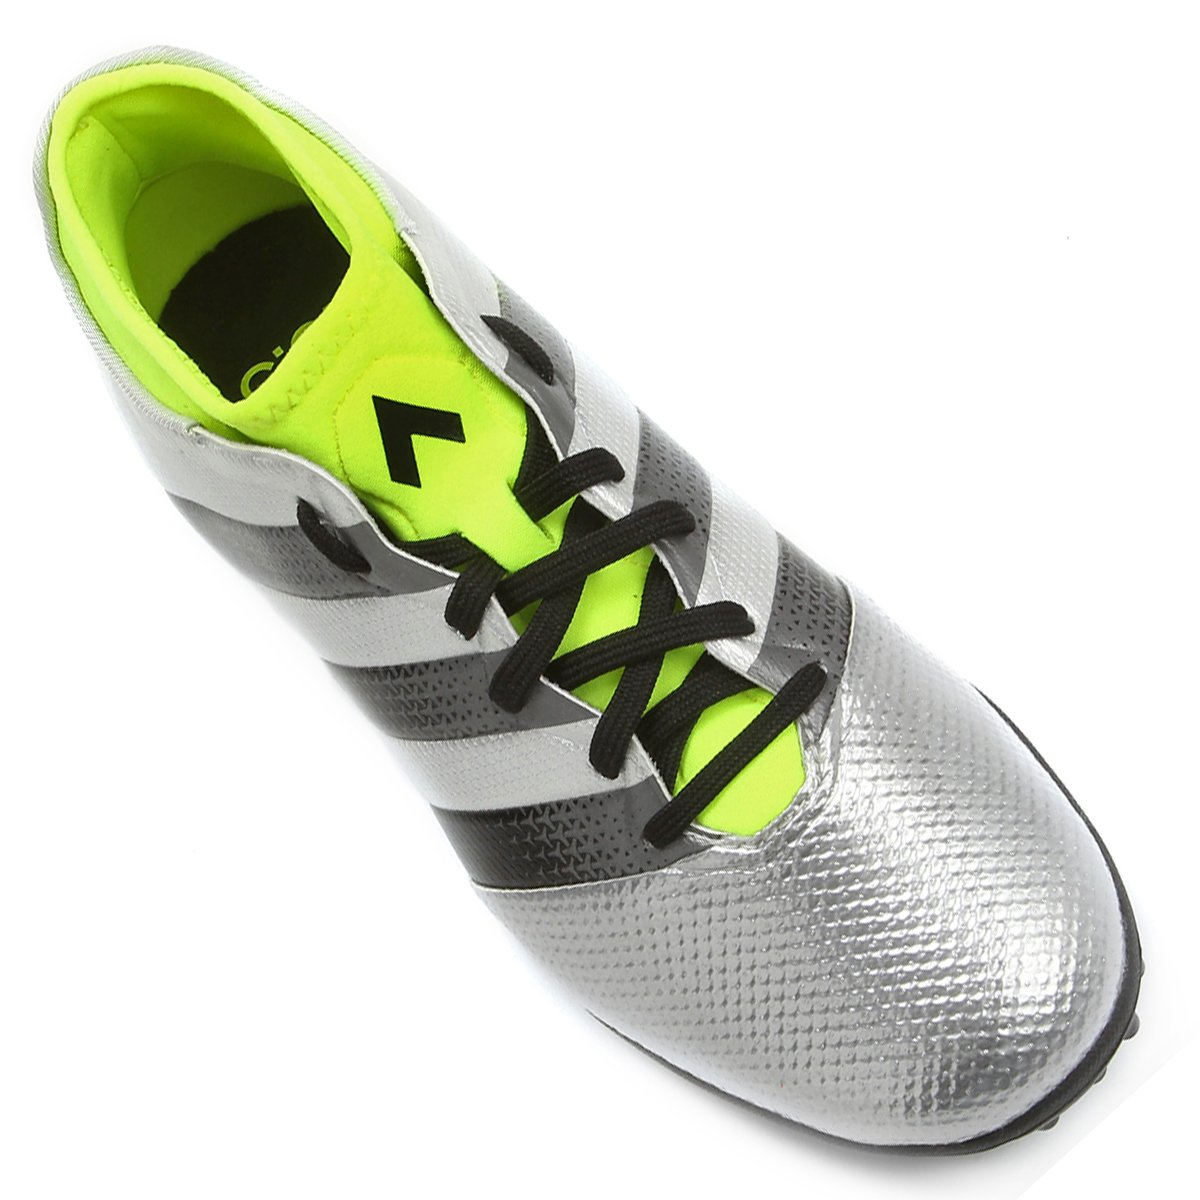 0e6485bdb5 Chuteira Society Adidas Ace 16.3 Primemesh TF Masculina - Prata e ...